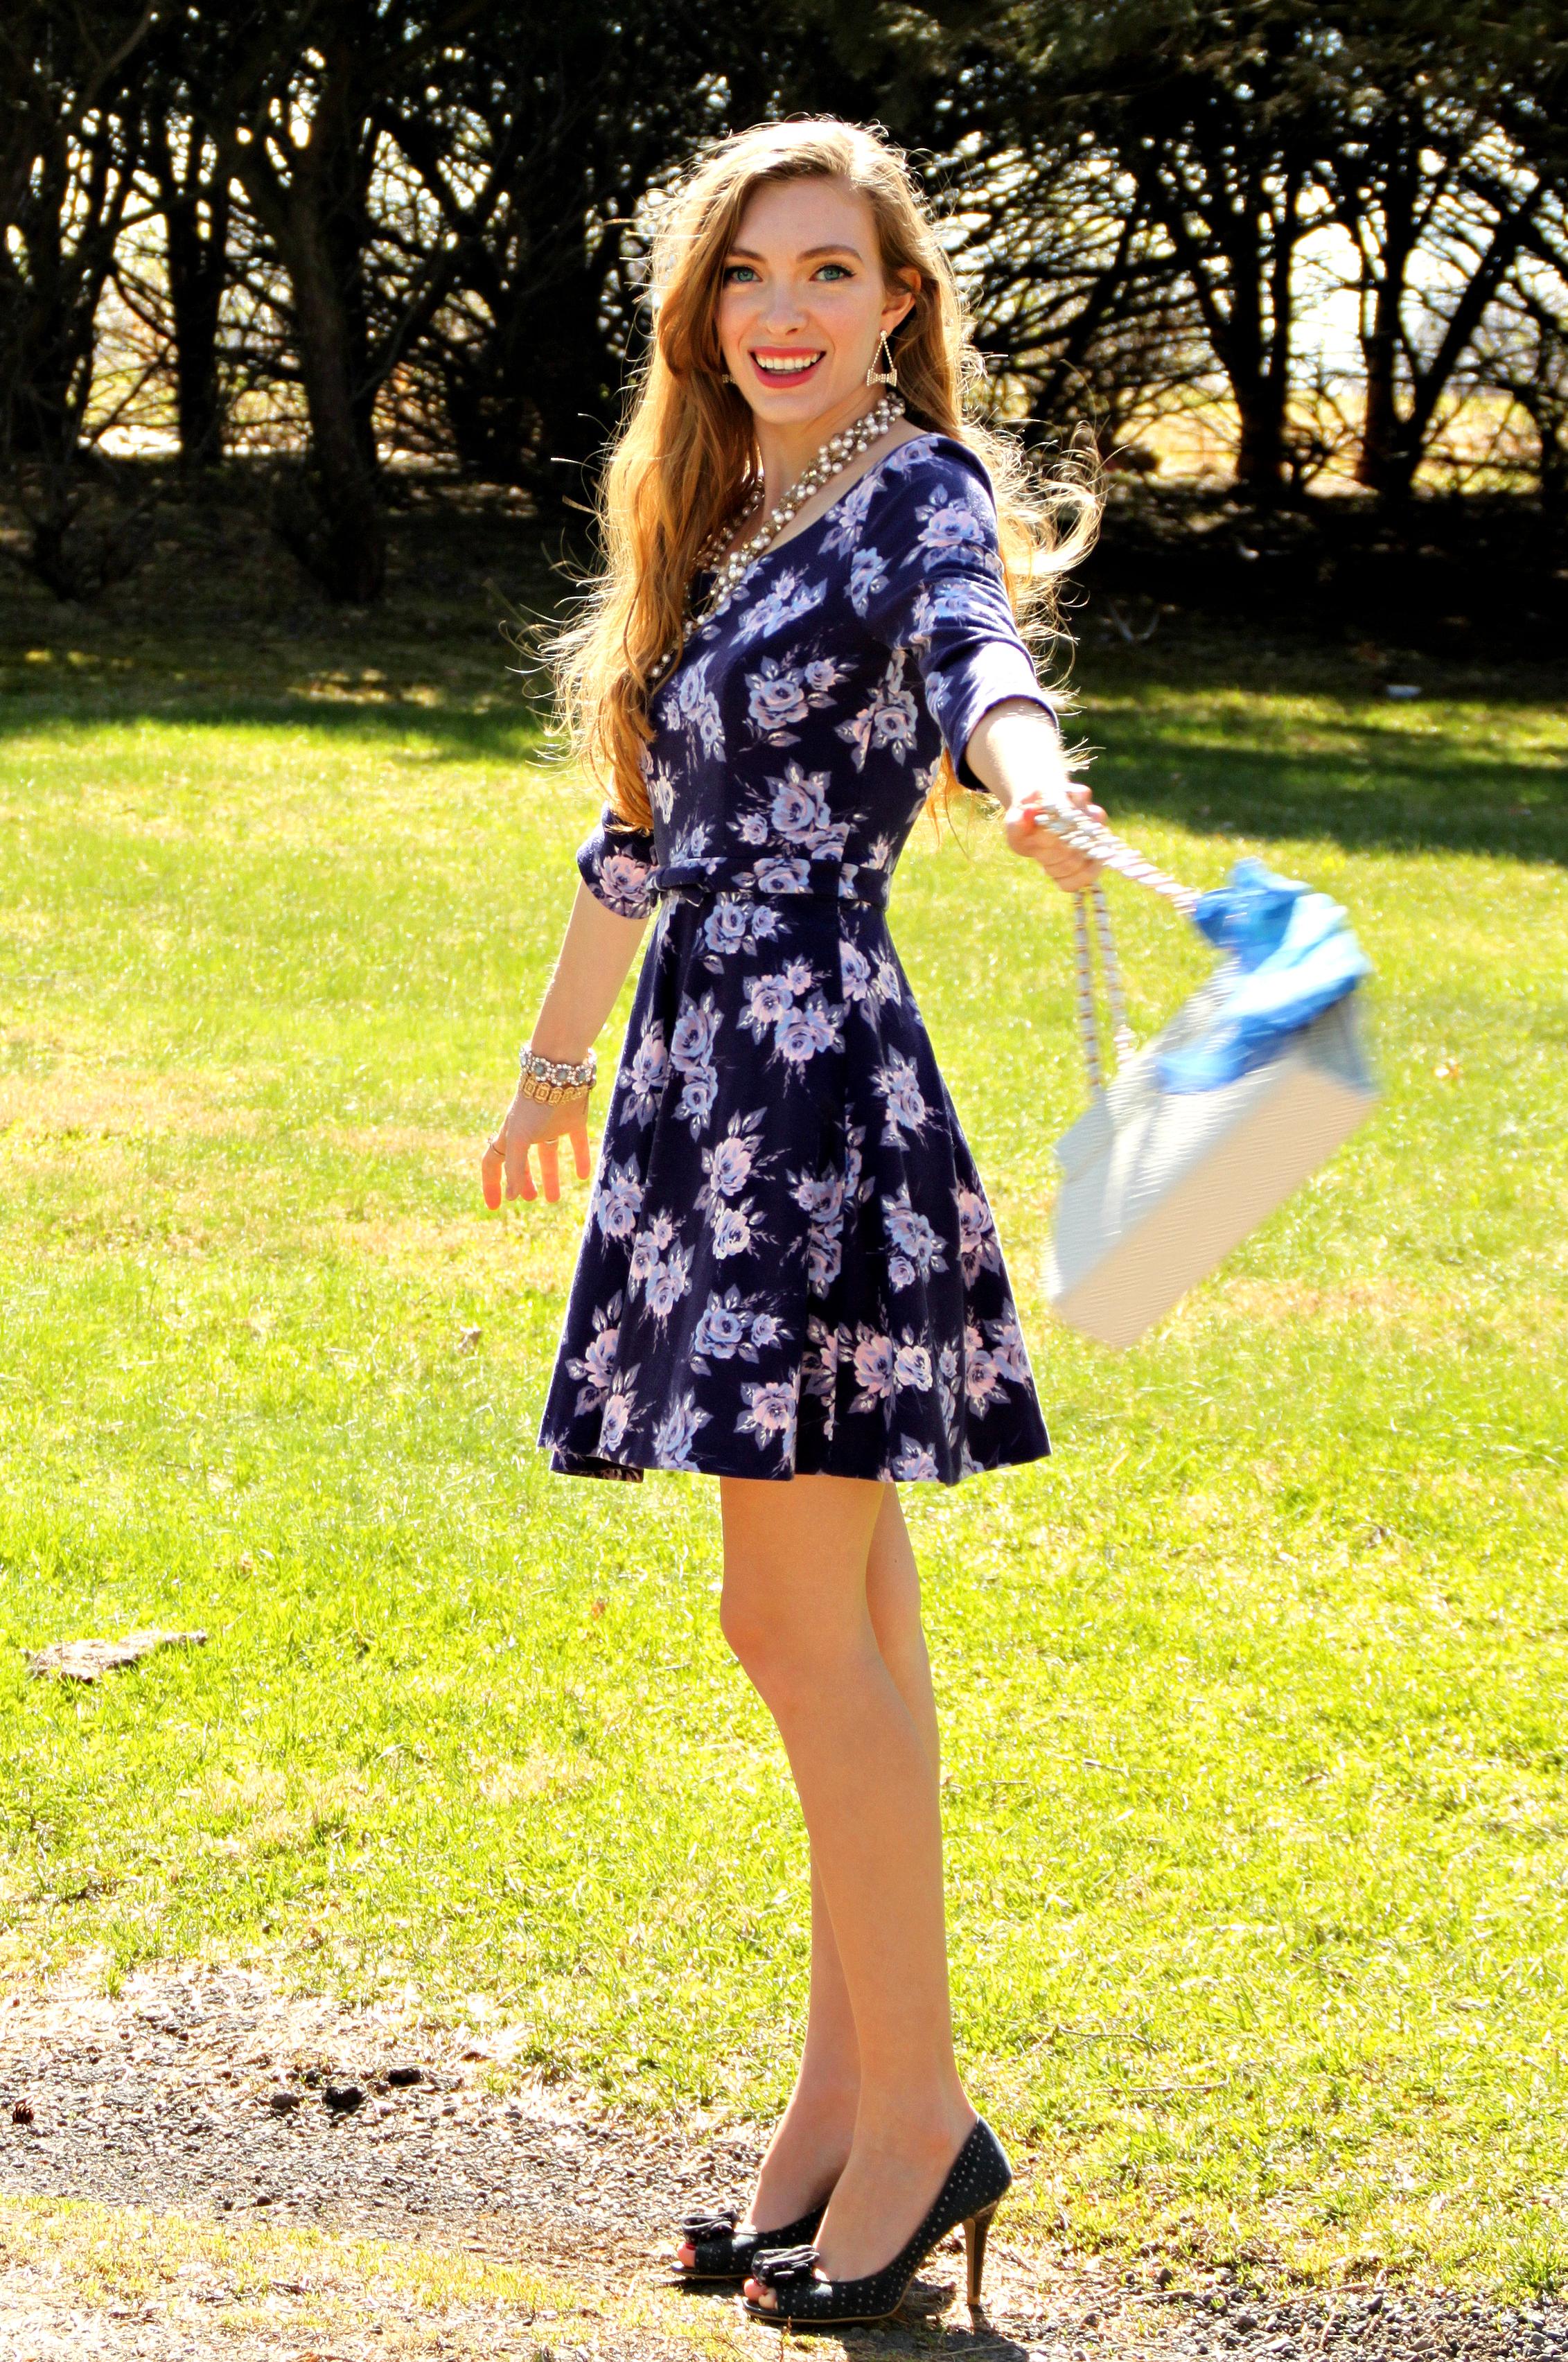 Dress LC Lauren Conrad, Heels Payless, Bag TJMaxx, Scarf Vintage.